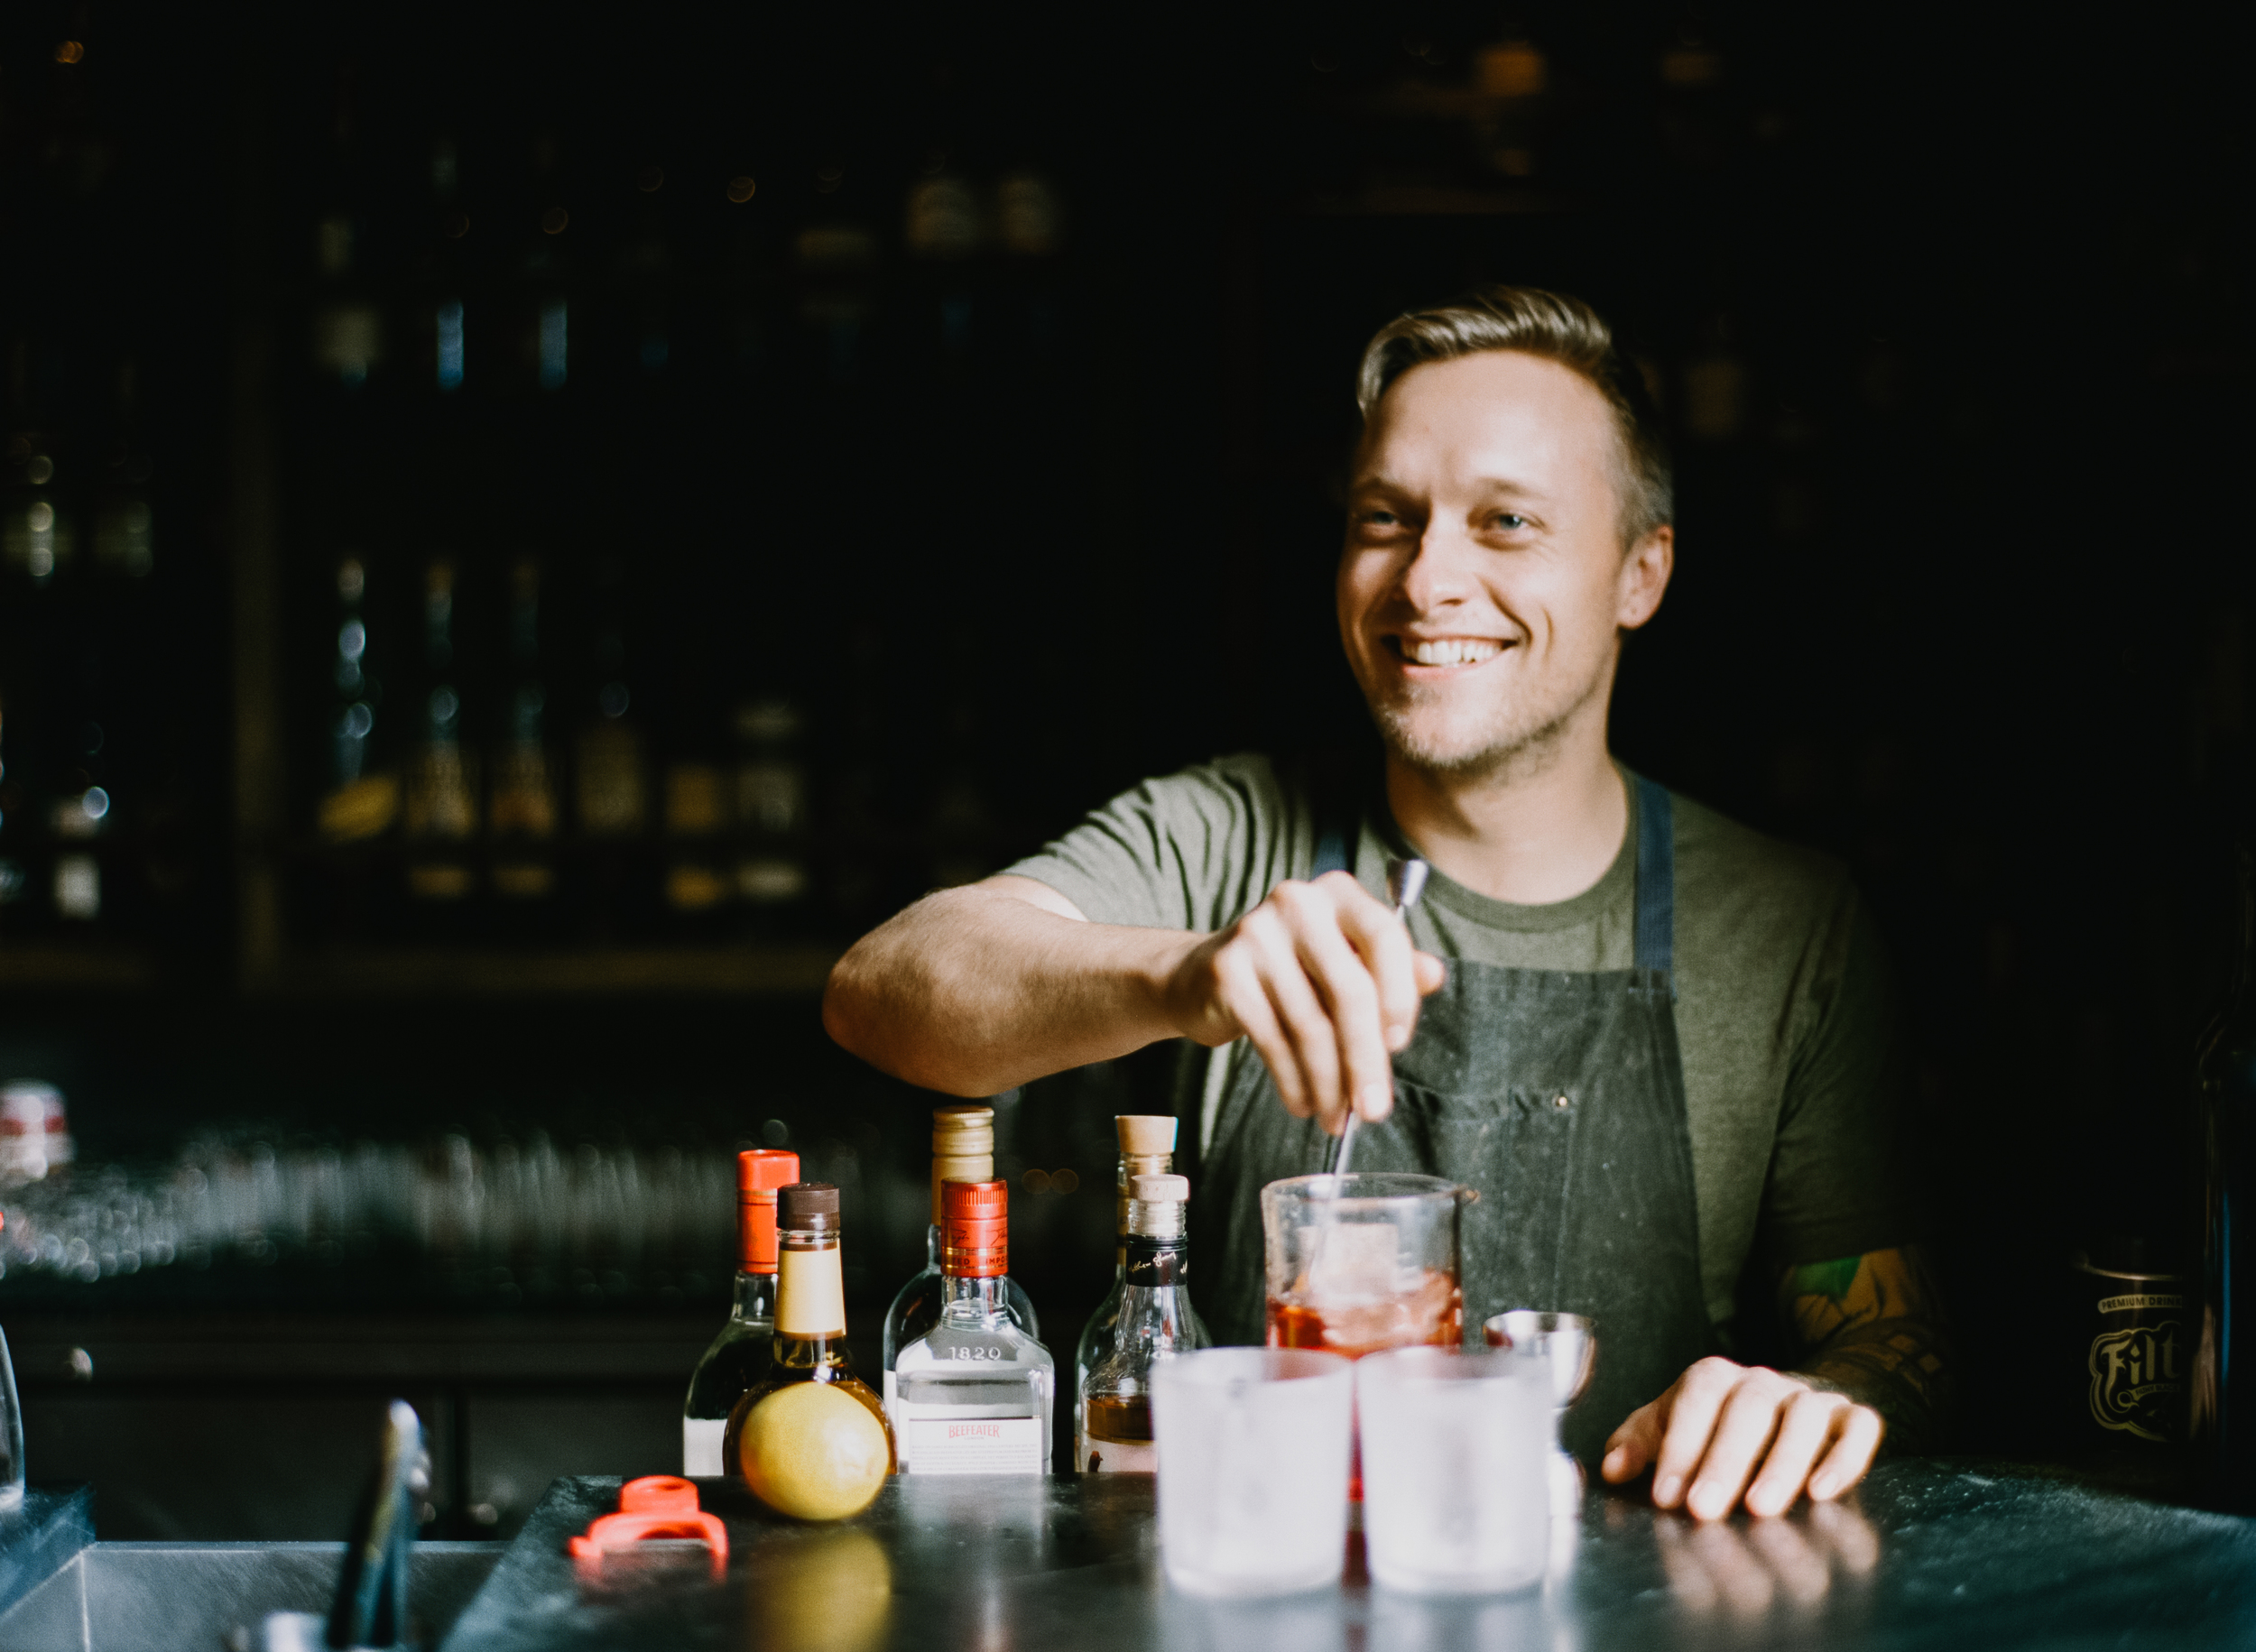 TrickDog_Bar_San_Francisco_City_Guide_Drinks_Cocktails_Lifestyle_Zack_Arp-755.jpg